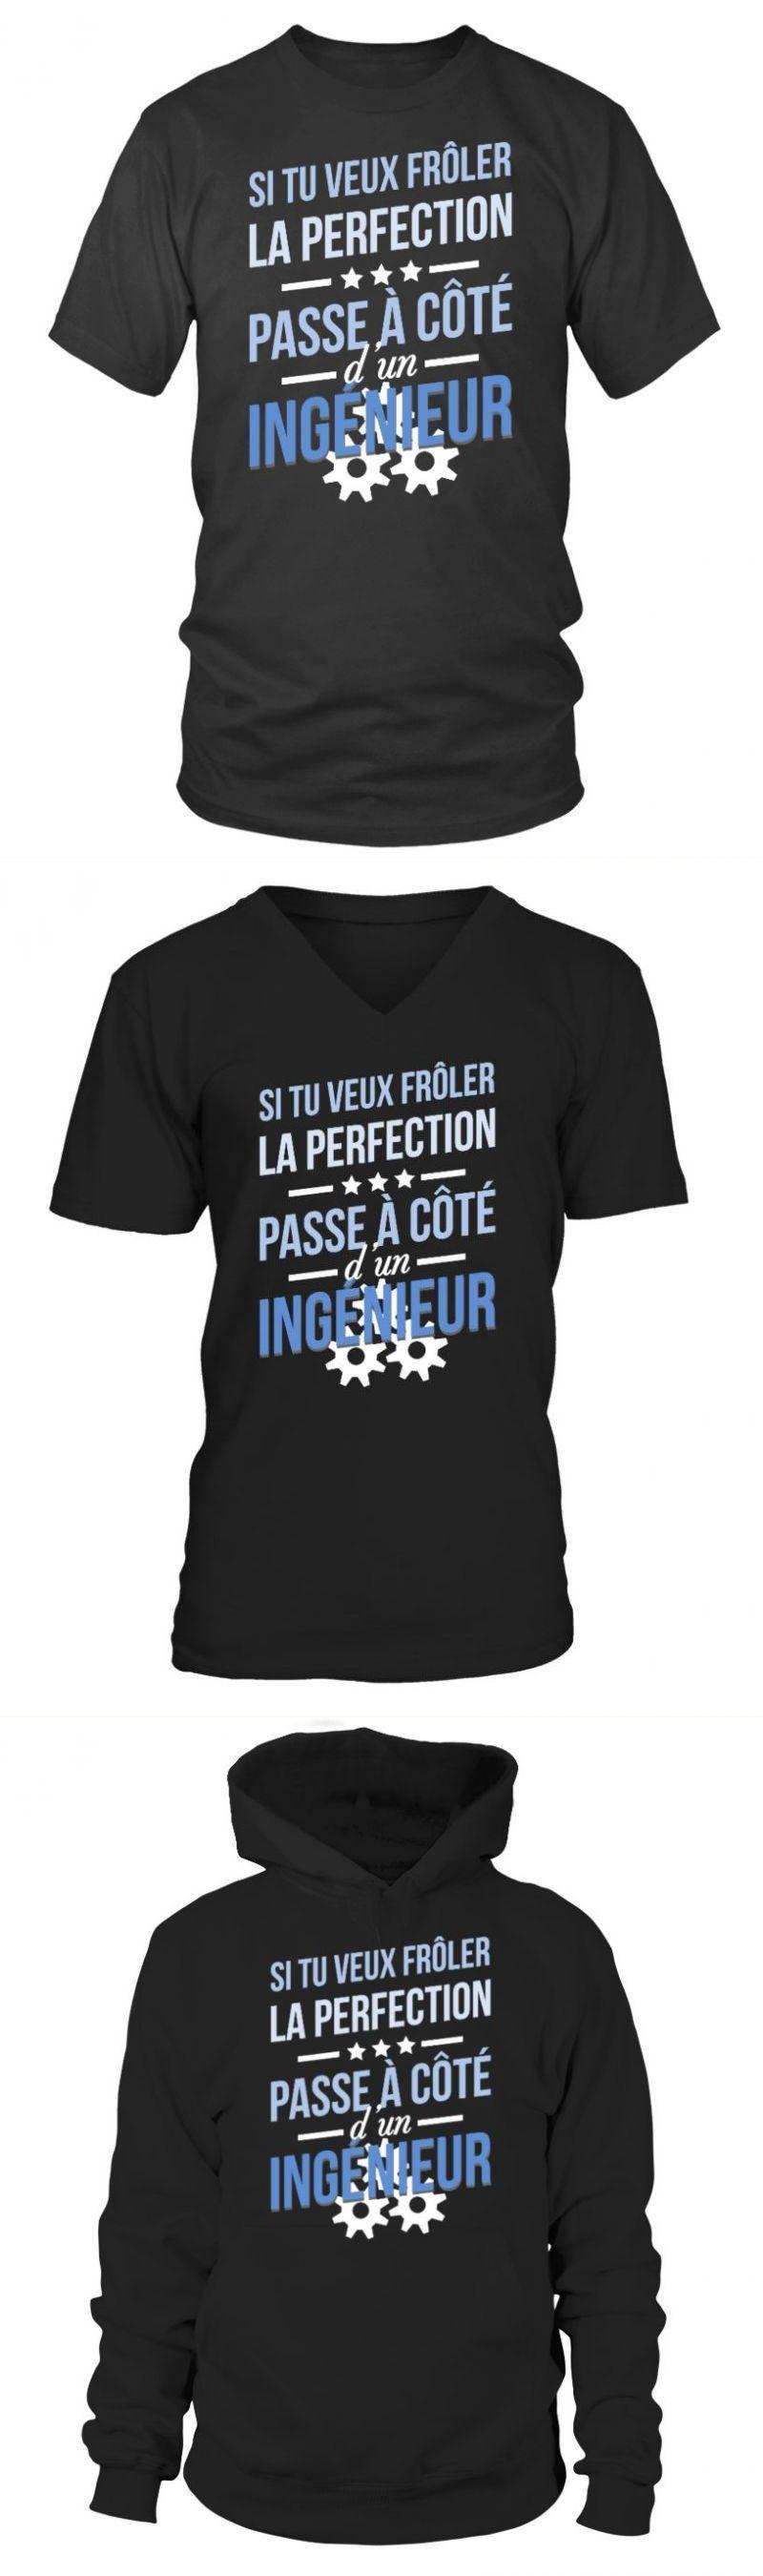 Engineer tshirt ingenieur frôler la perfection